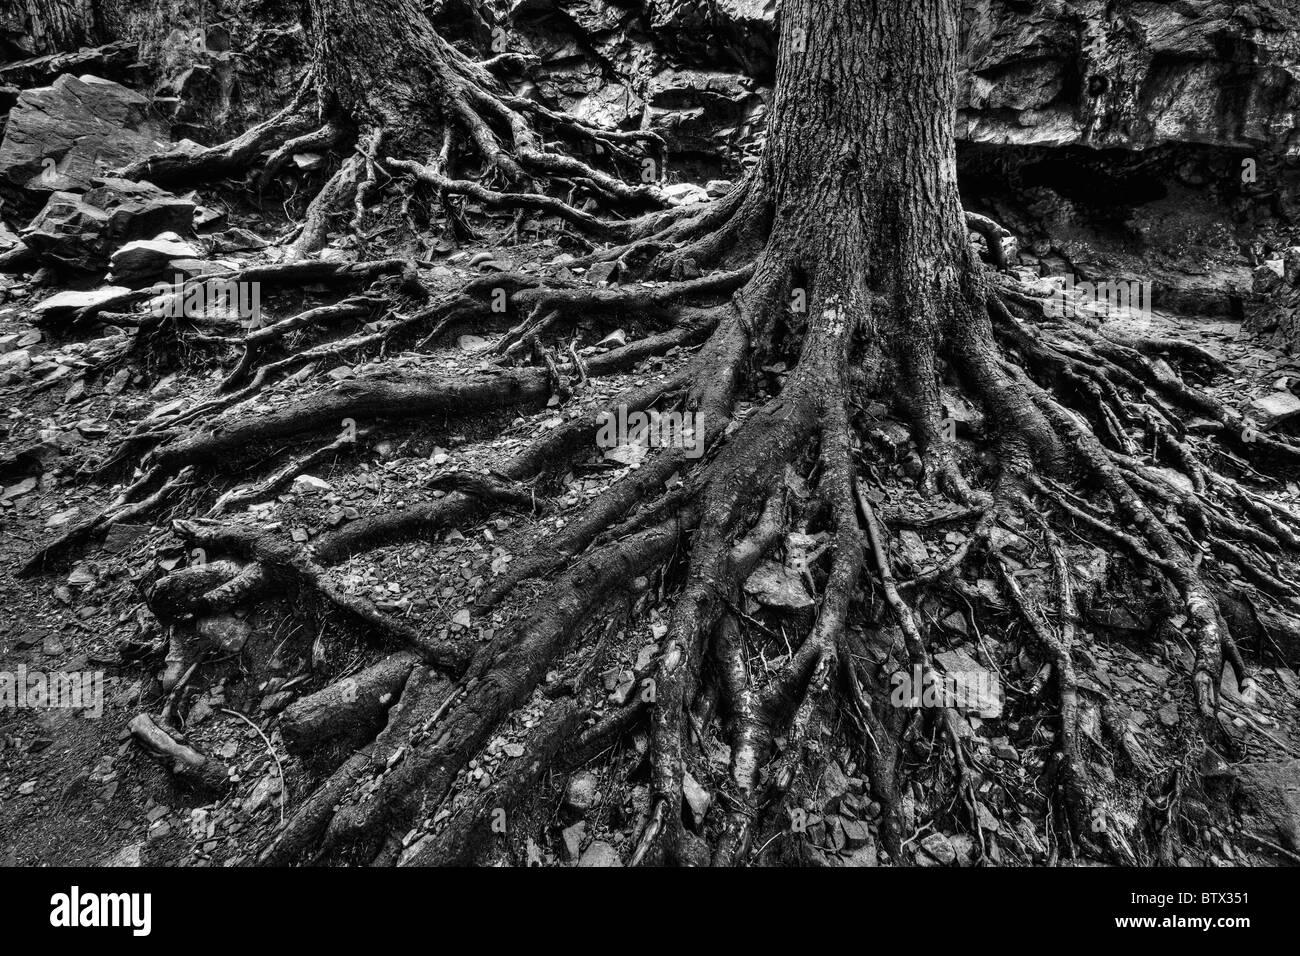 Exposed roots of trees. Washington Cascades. - Stock Image